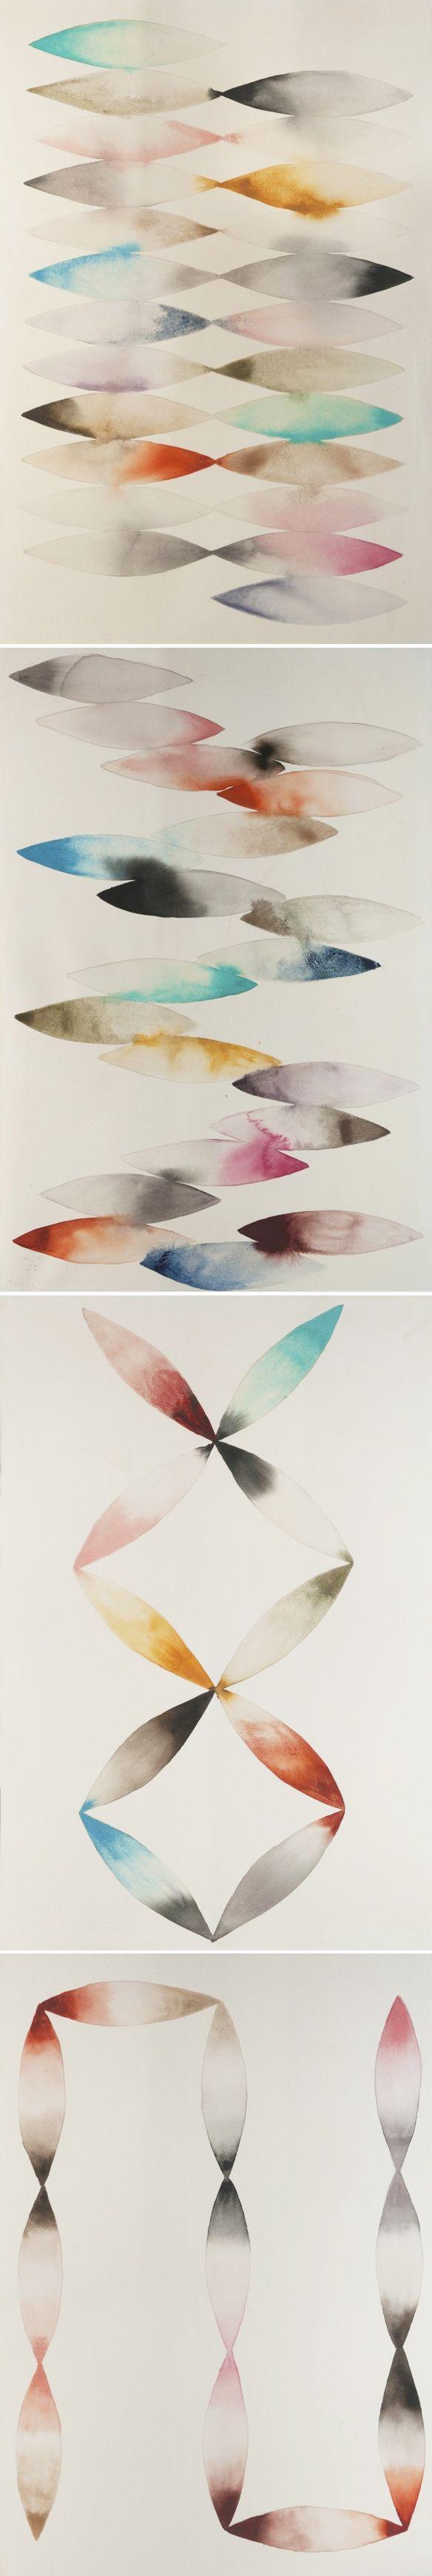 The Jealous Curator /// curated contemporary art /// lourdes sanchez